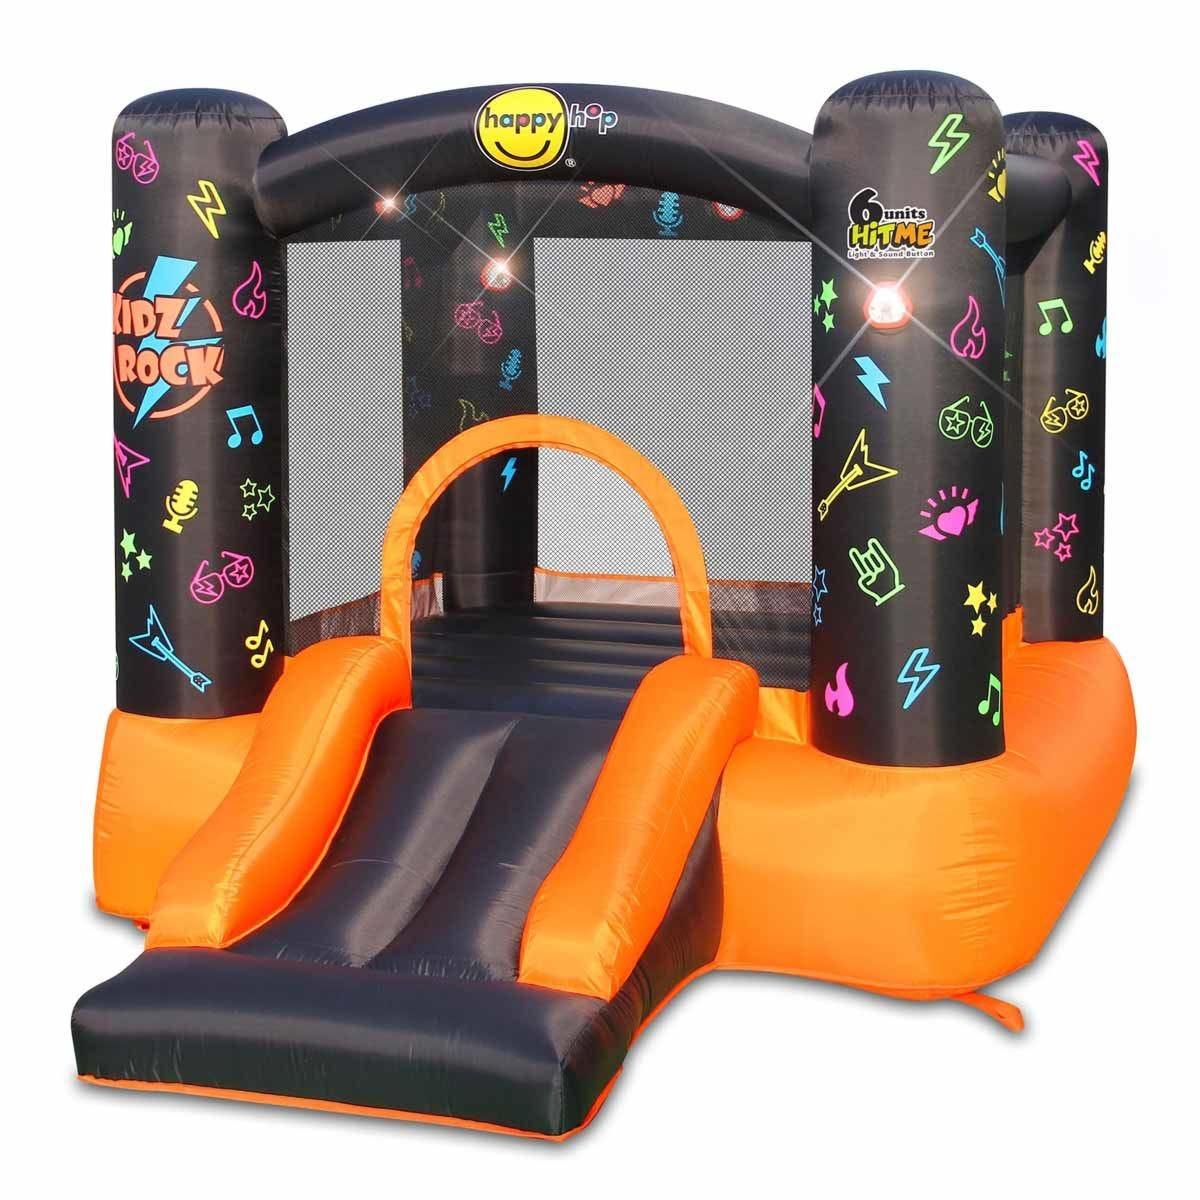 Happy Hop Kidz Rock Hit Me Inflatable Play Centre